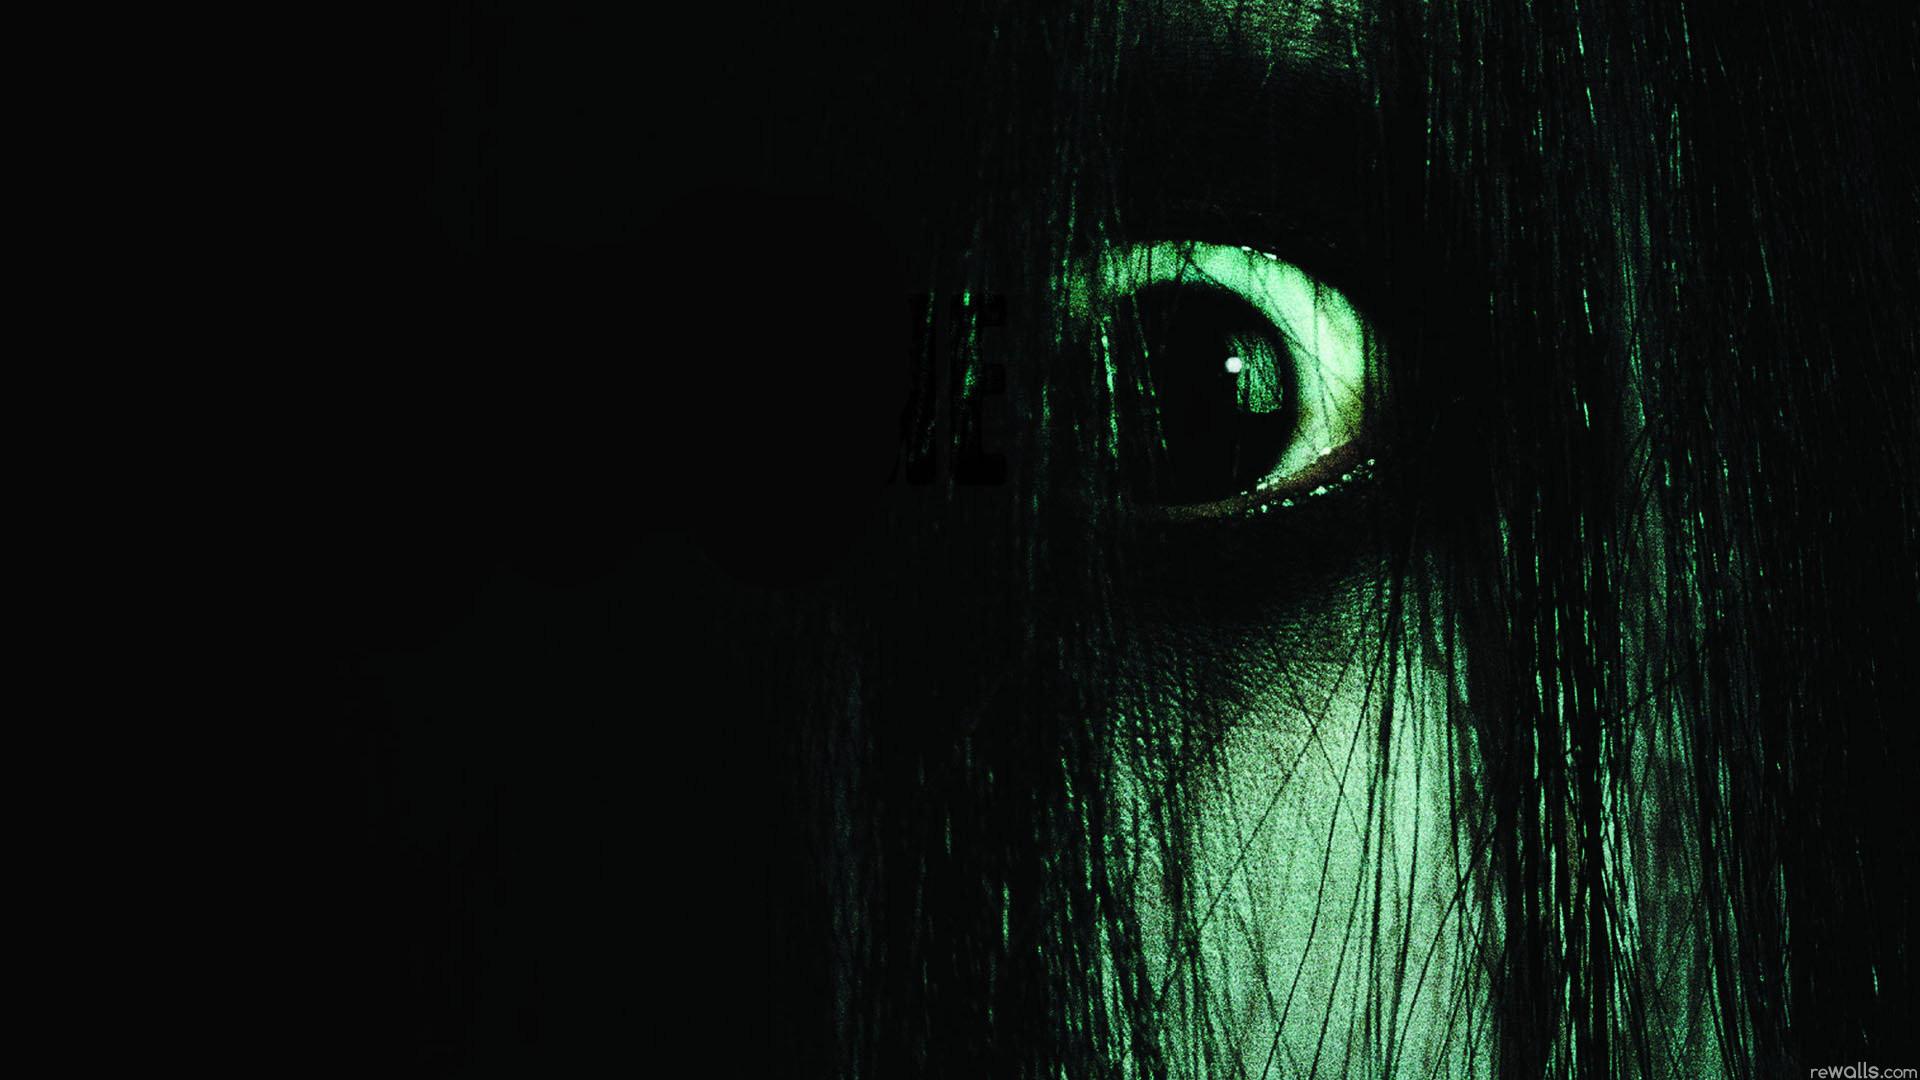 horror eye wallpaper hd - photo #48